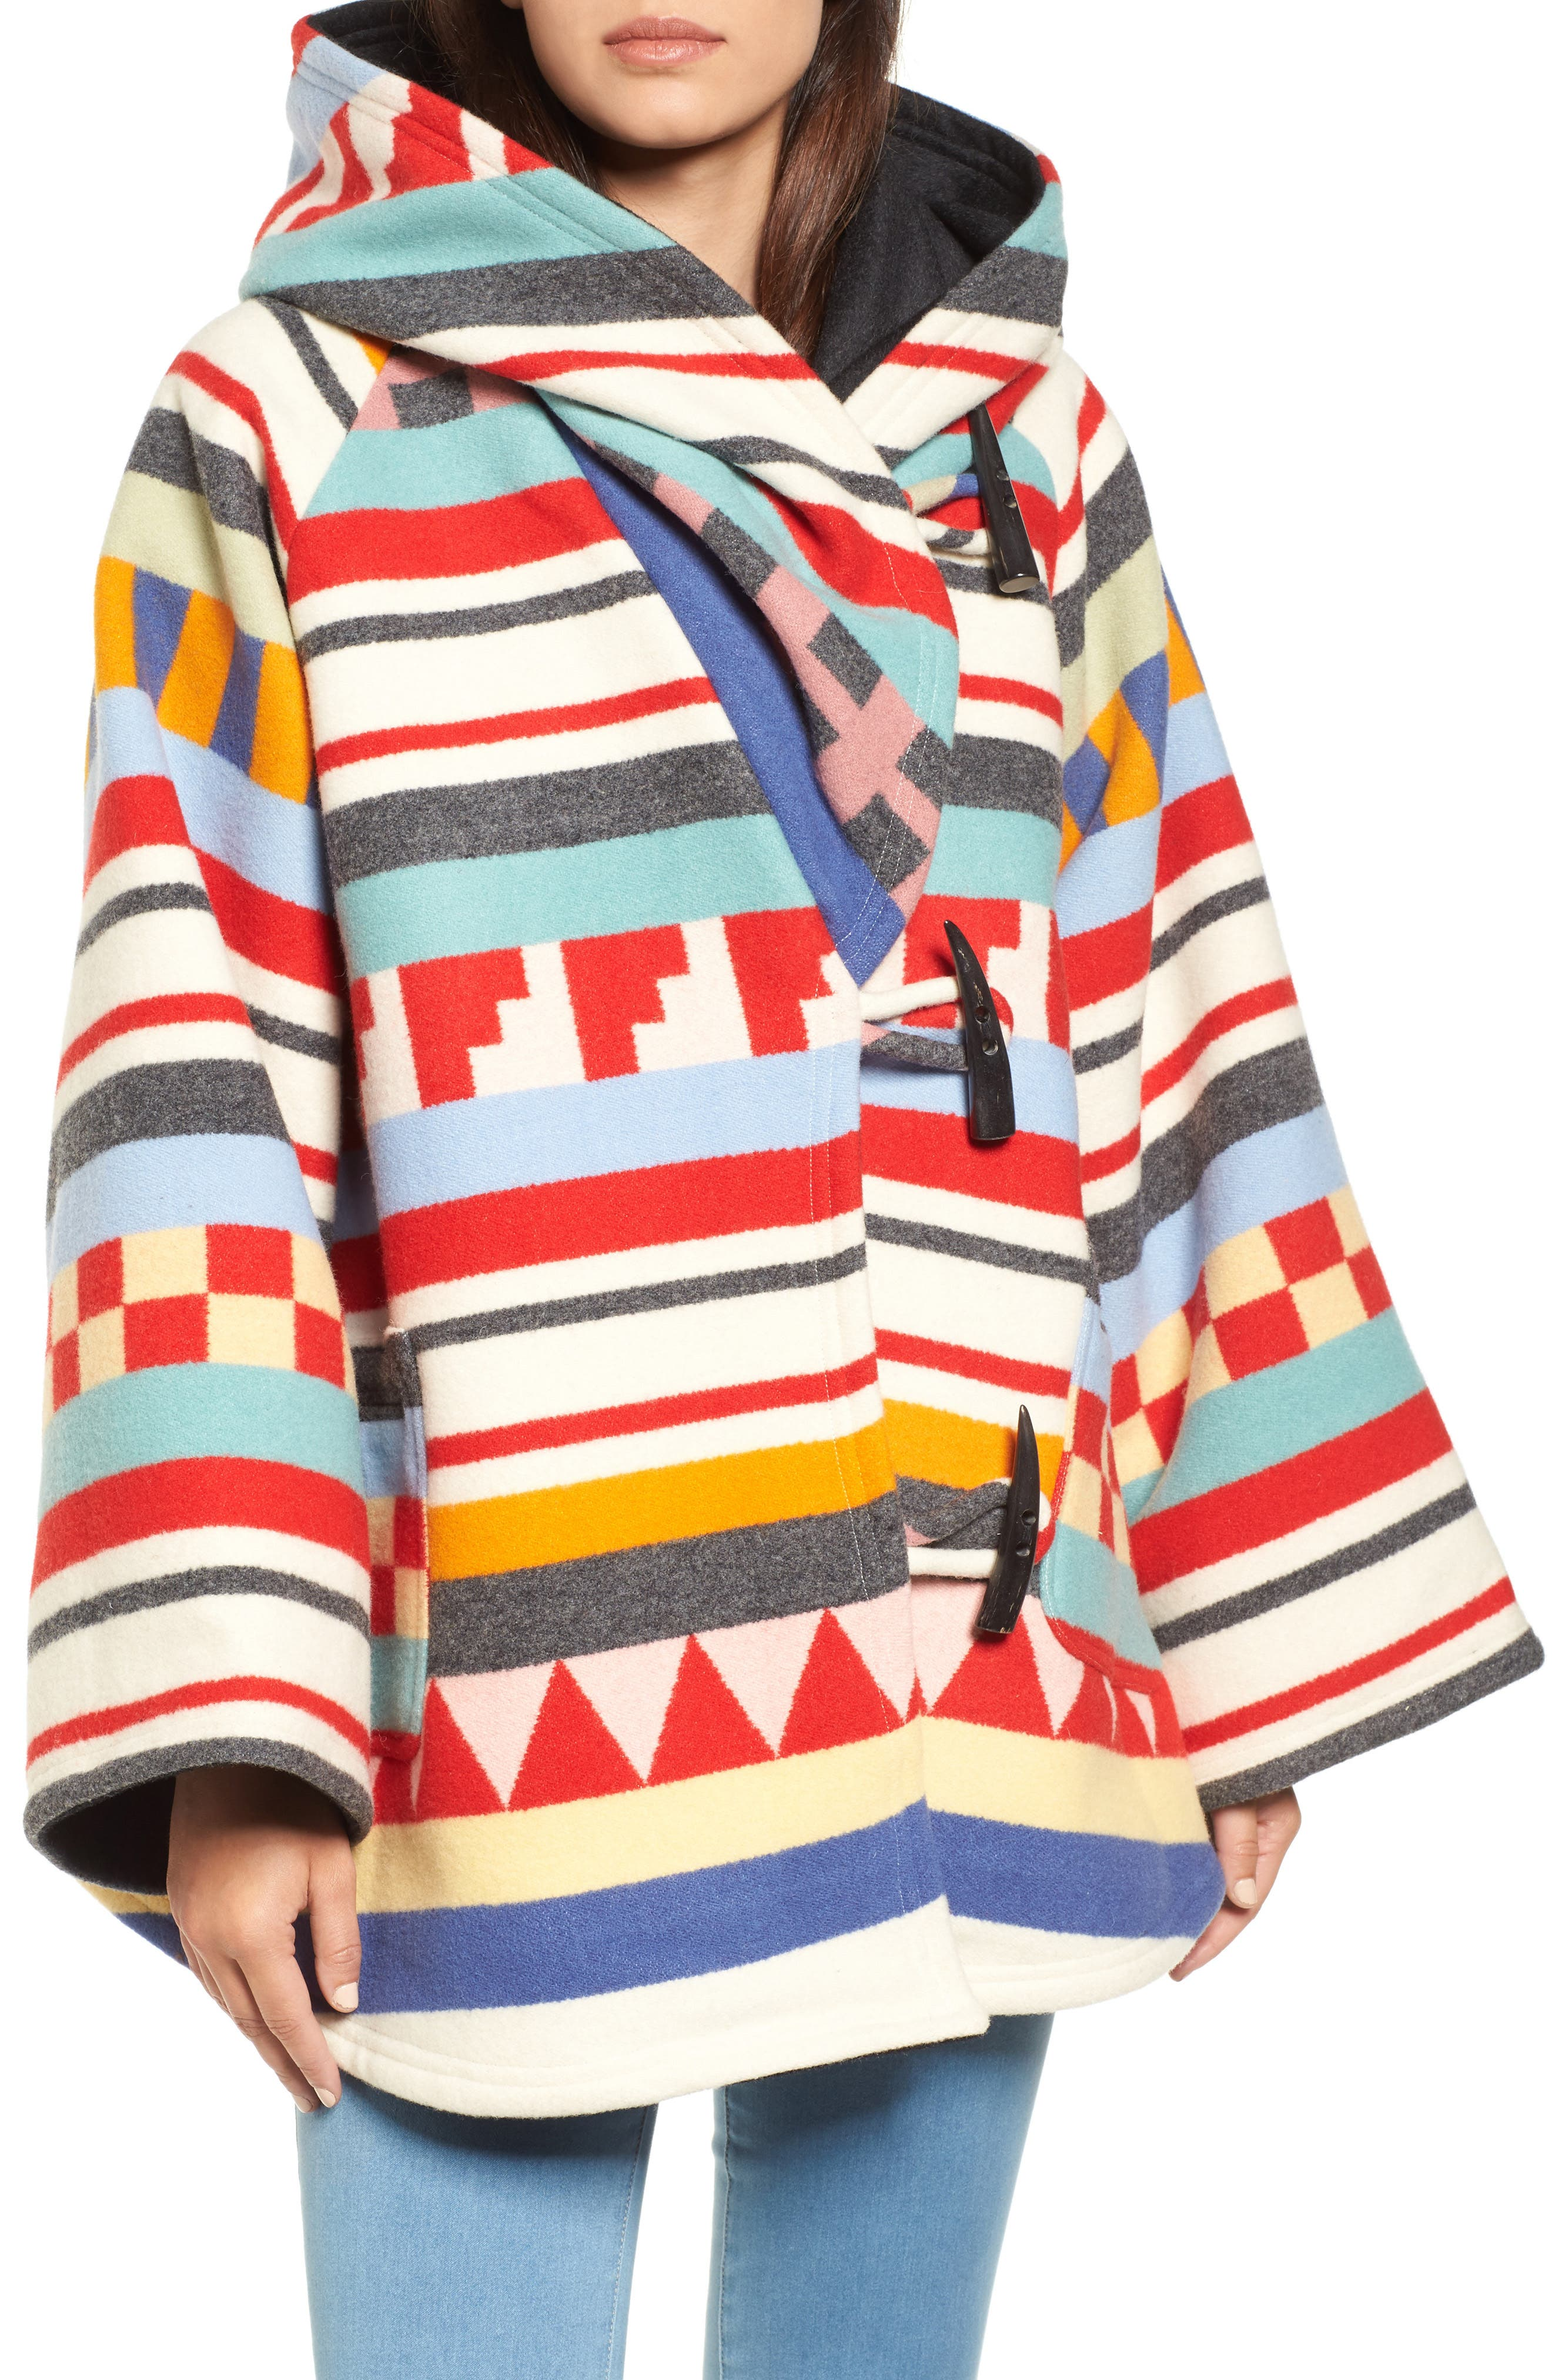 x Pendleton Wool Blend Hooded Cape,                             Alternate thumbnail 4, color,                             WHITE MULTI